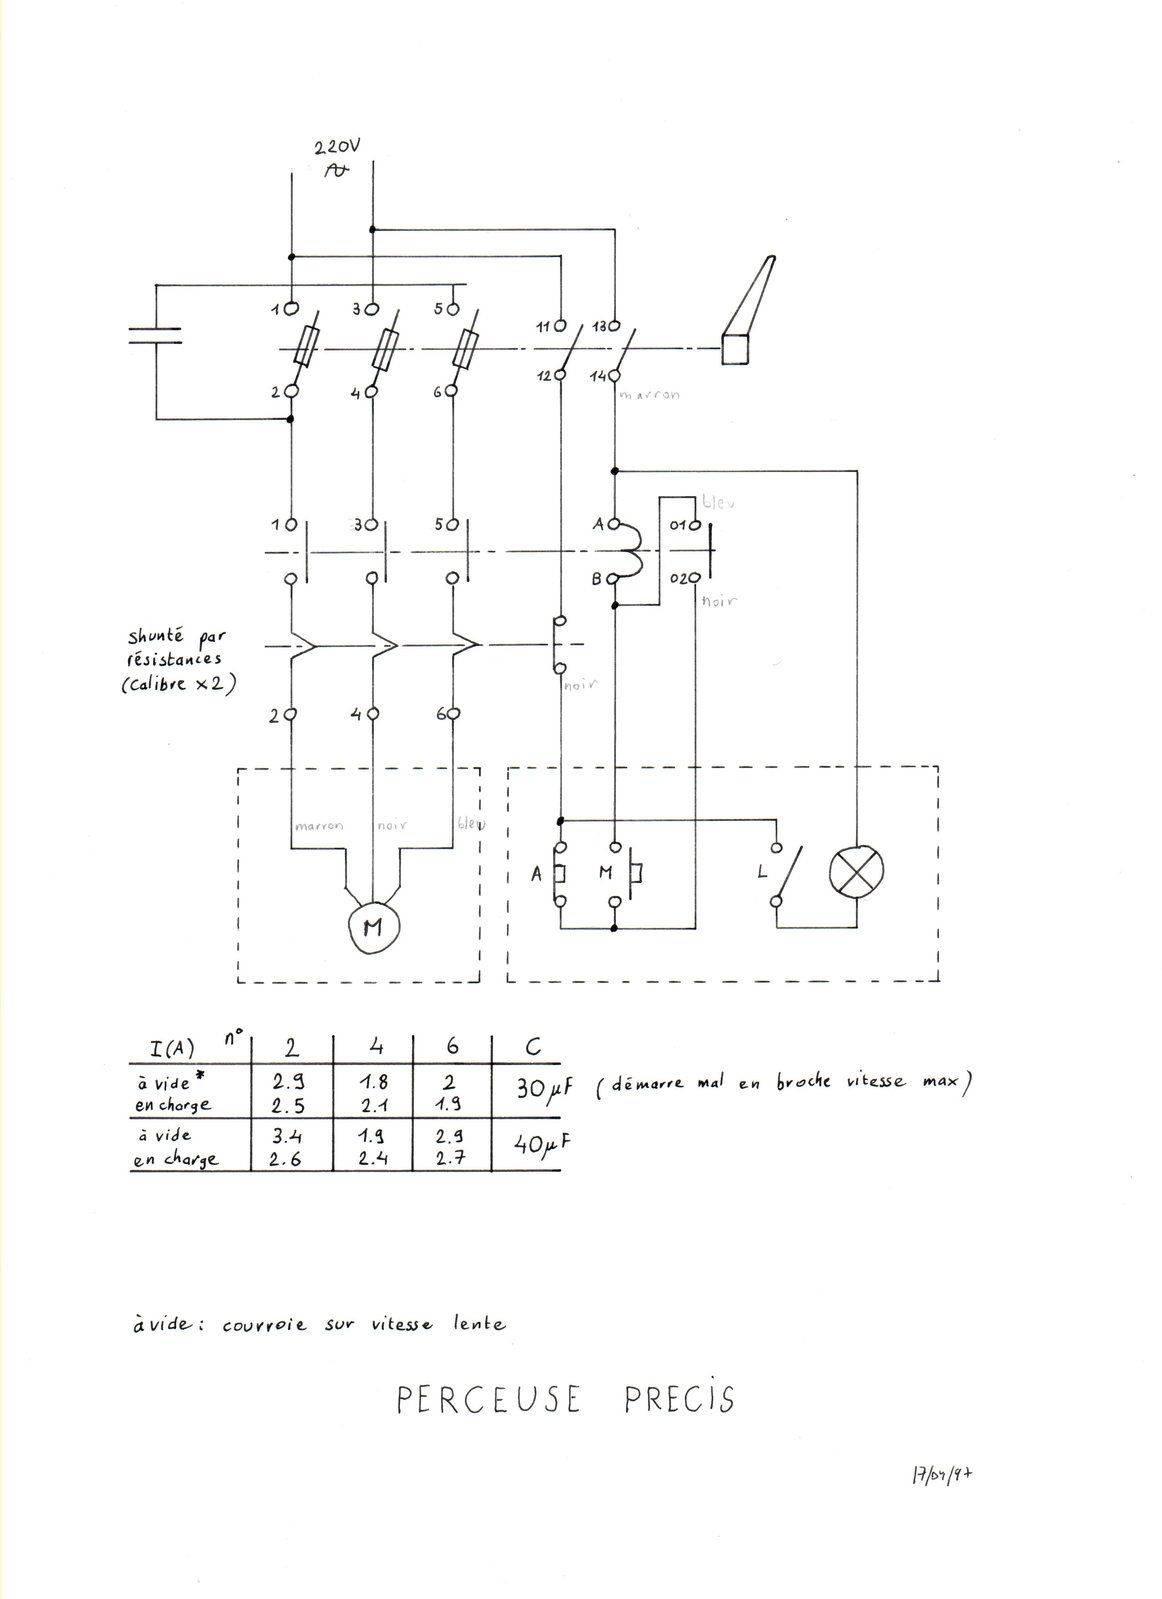 Plan de câblage perceuse Précis.jpg